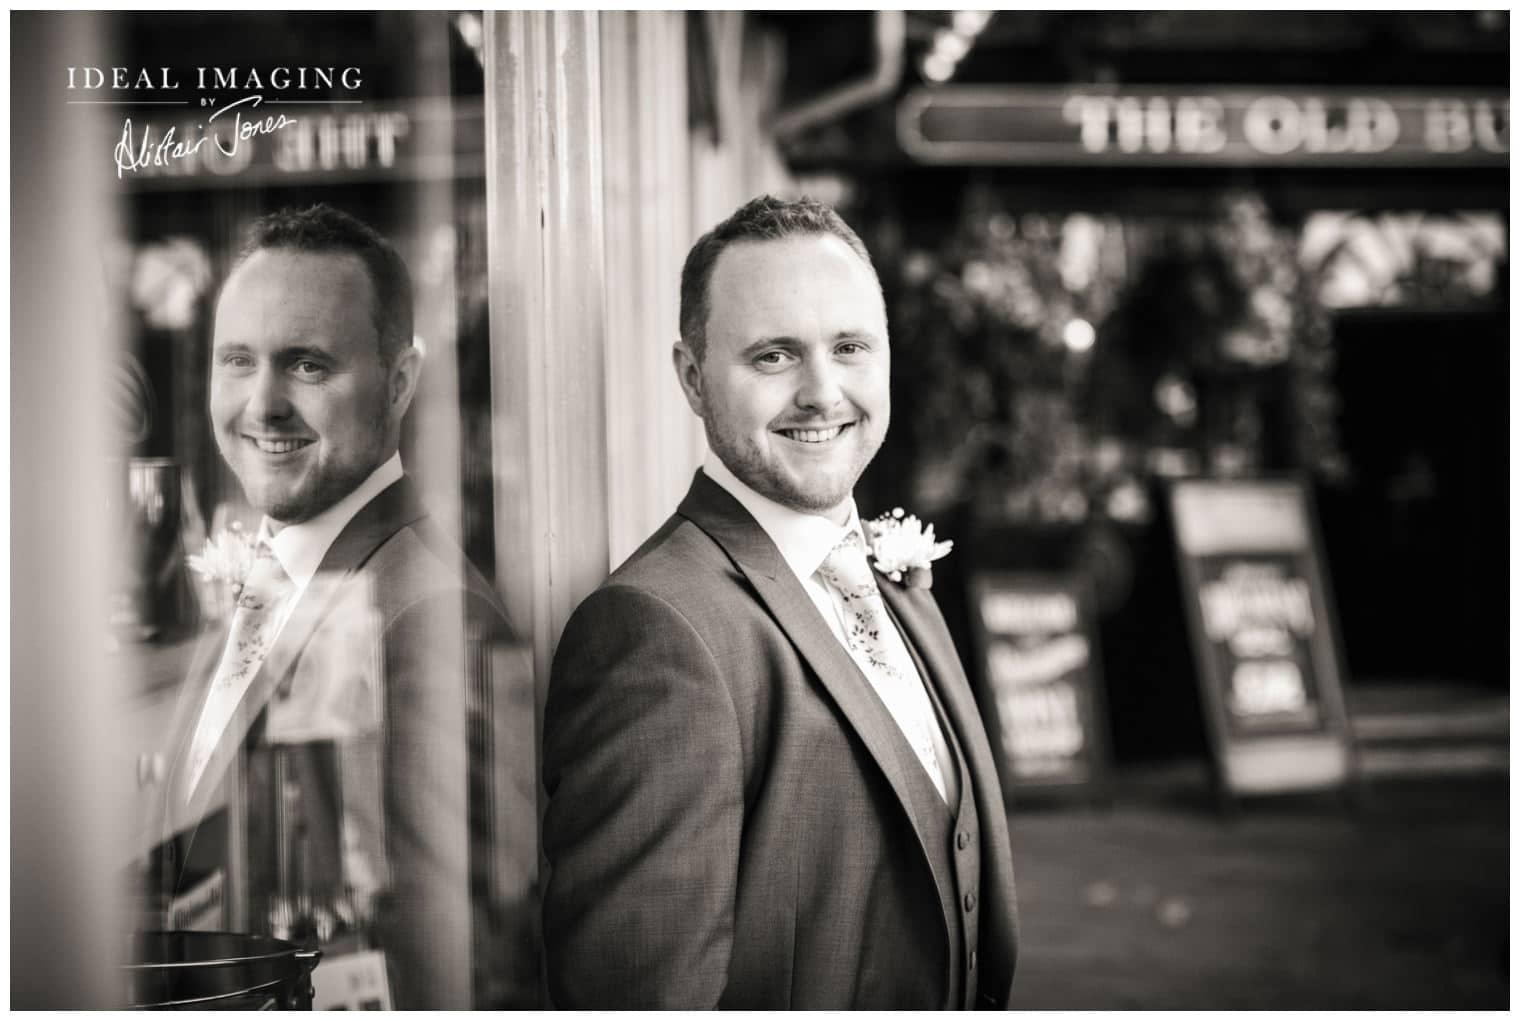 canterbury_cathedral_wedding-011